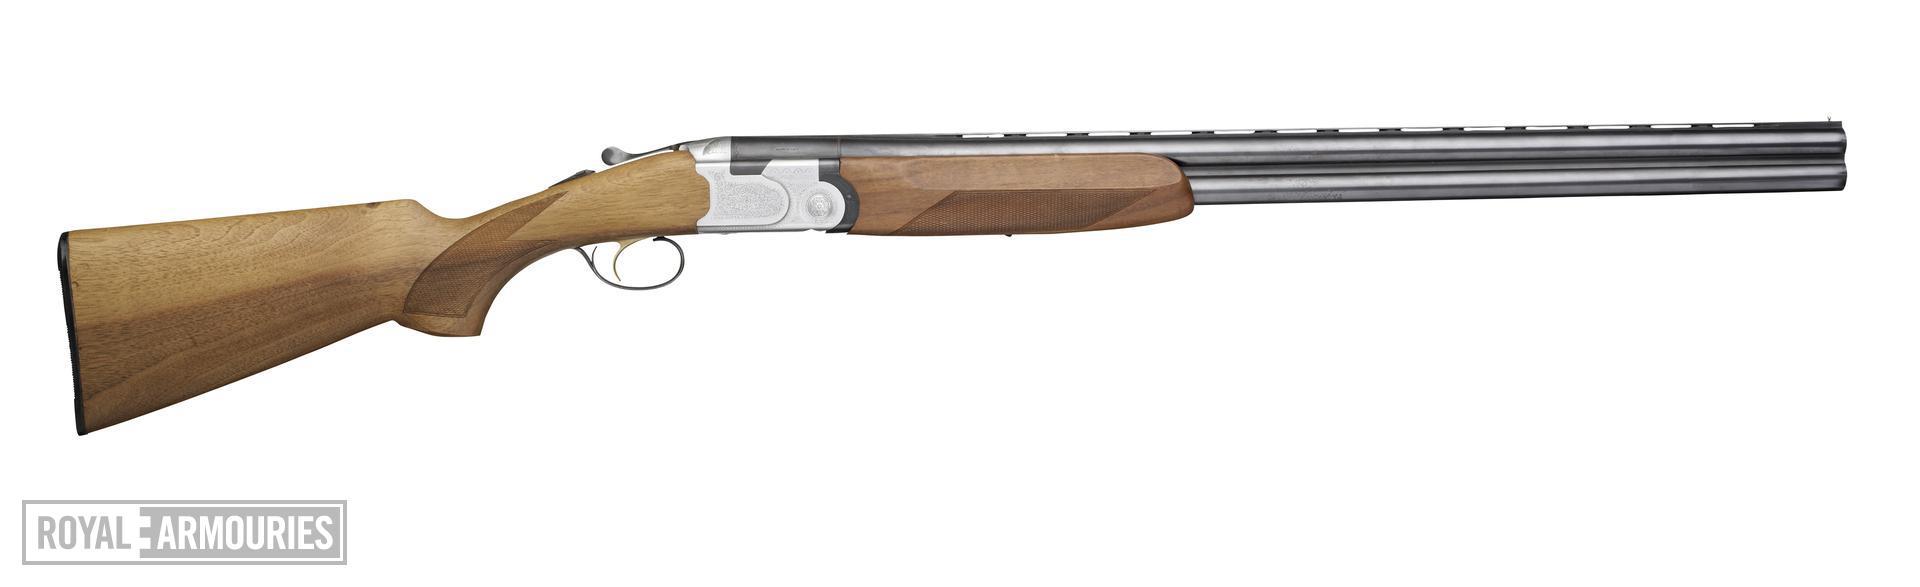 Centrefire over-and-under hammerless shotgun - Beretta Model S-686 Special